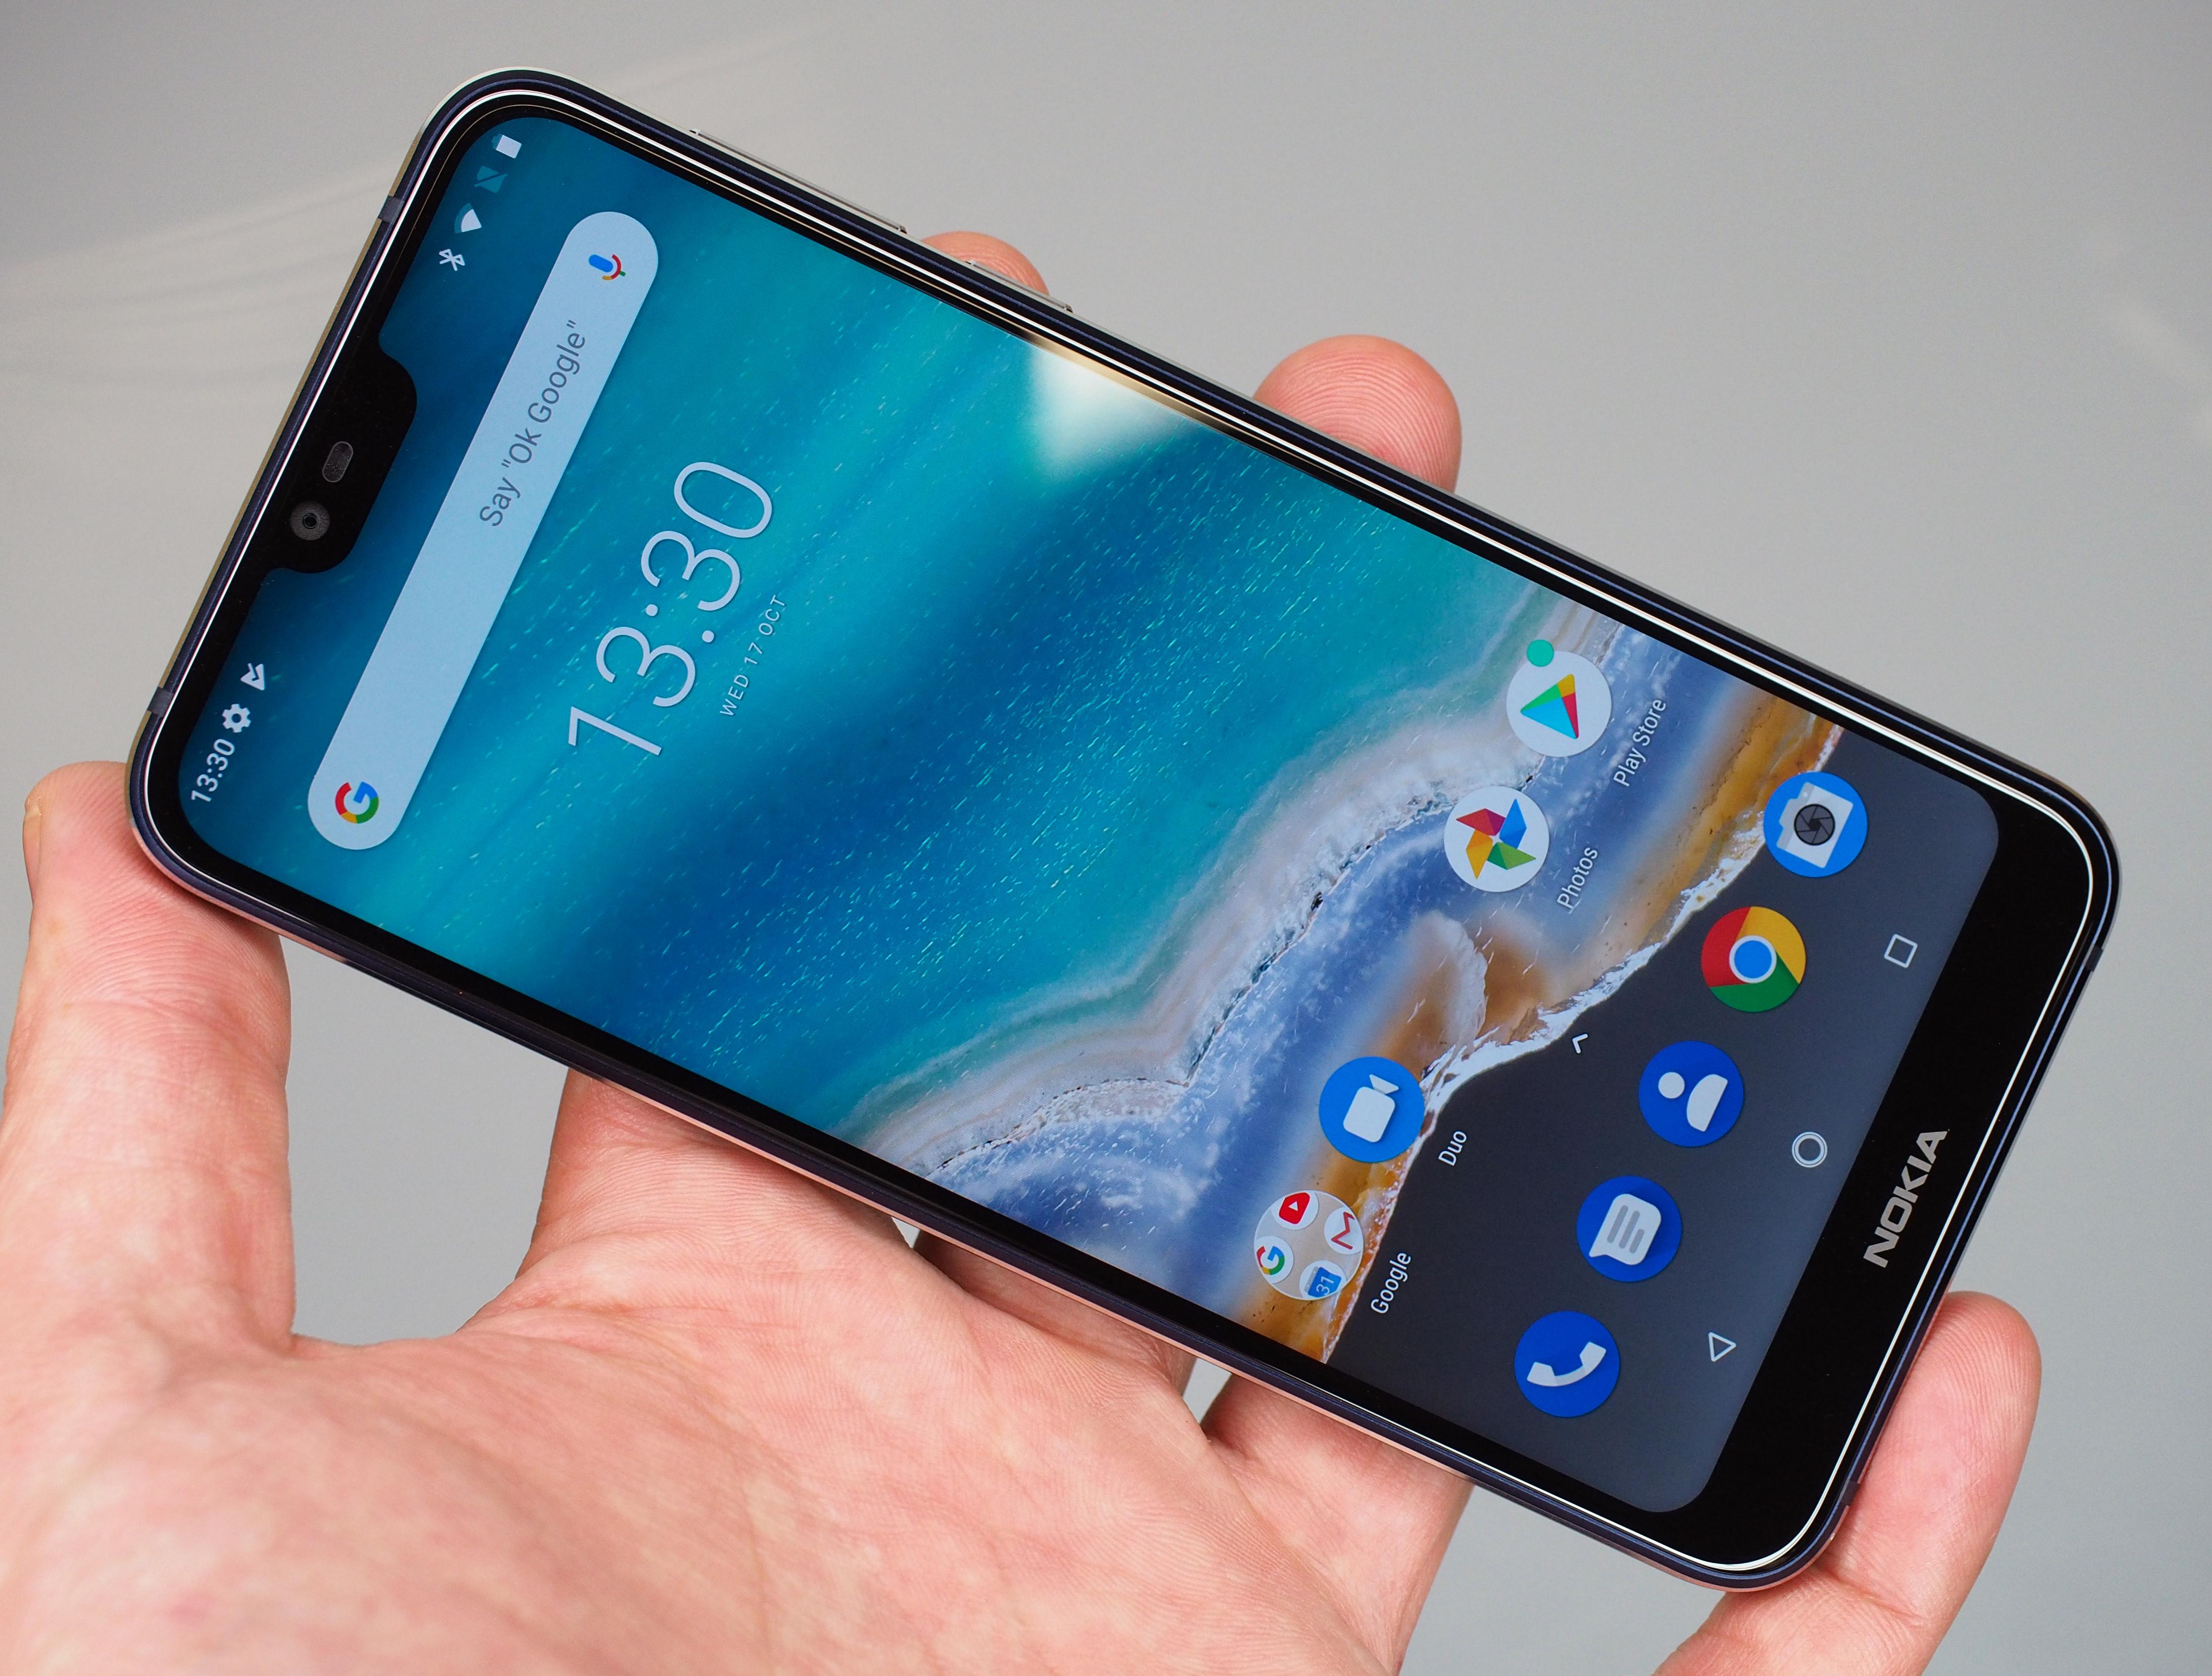 Top 13 Best Mid-Range Smartphones For Photography 2019 | ePHOTOzine